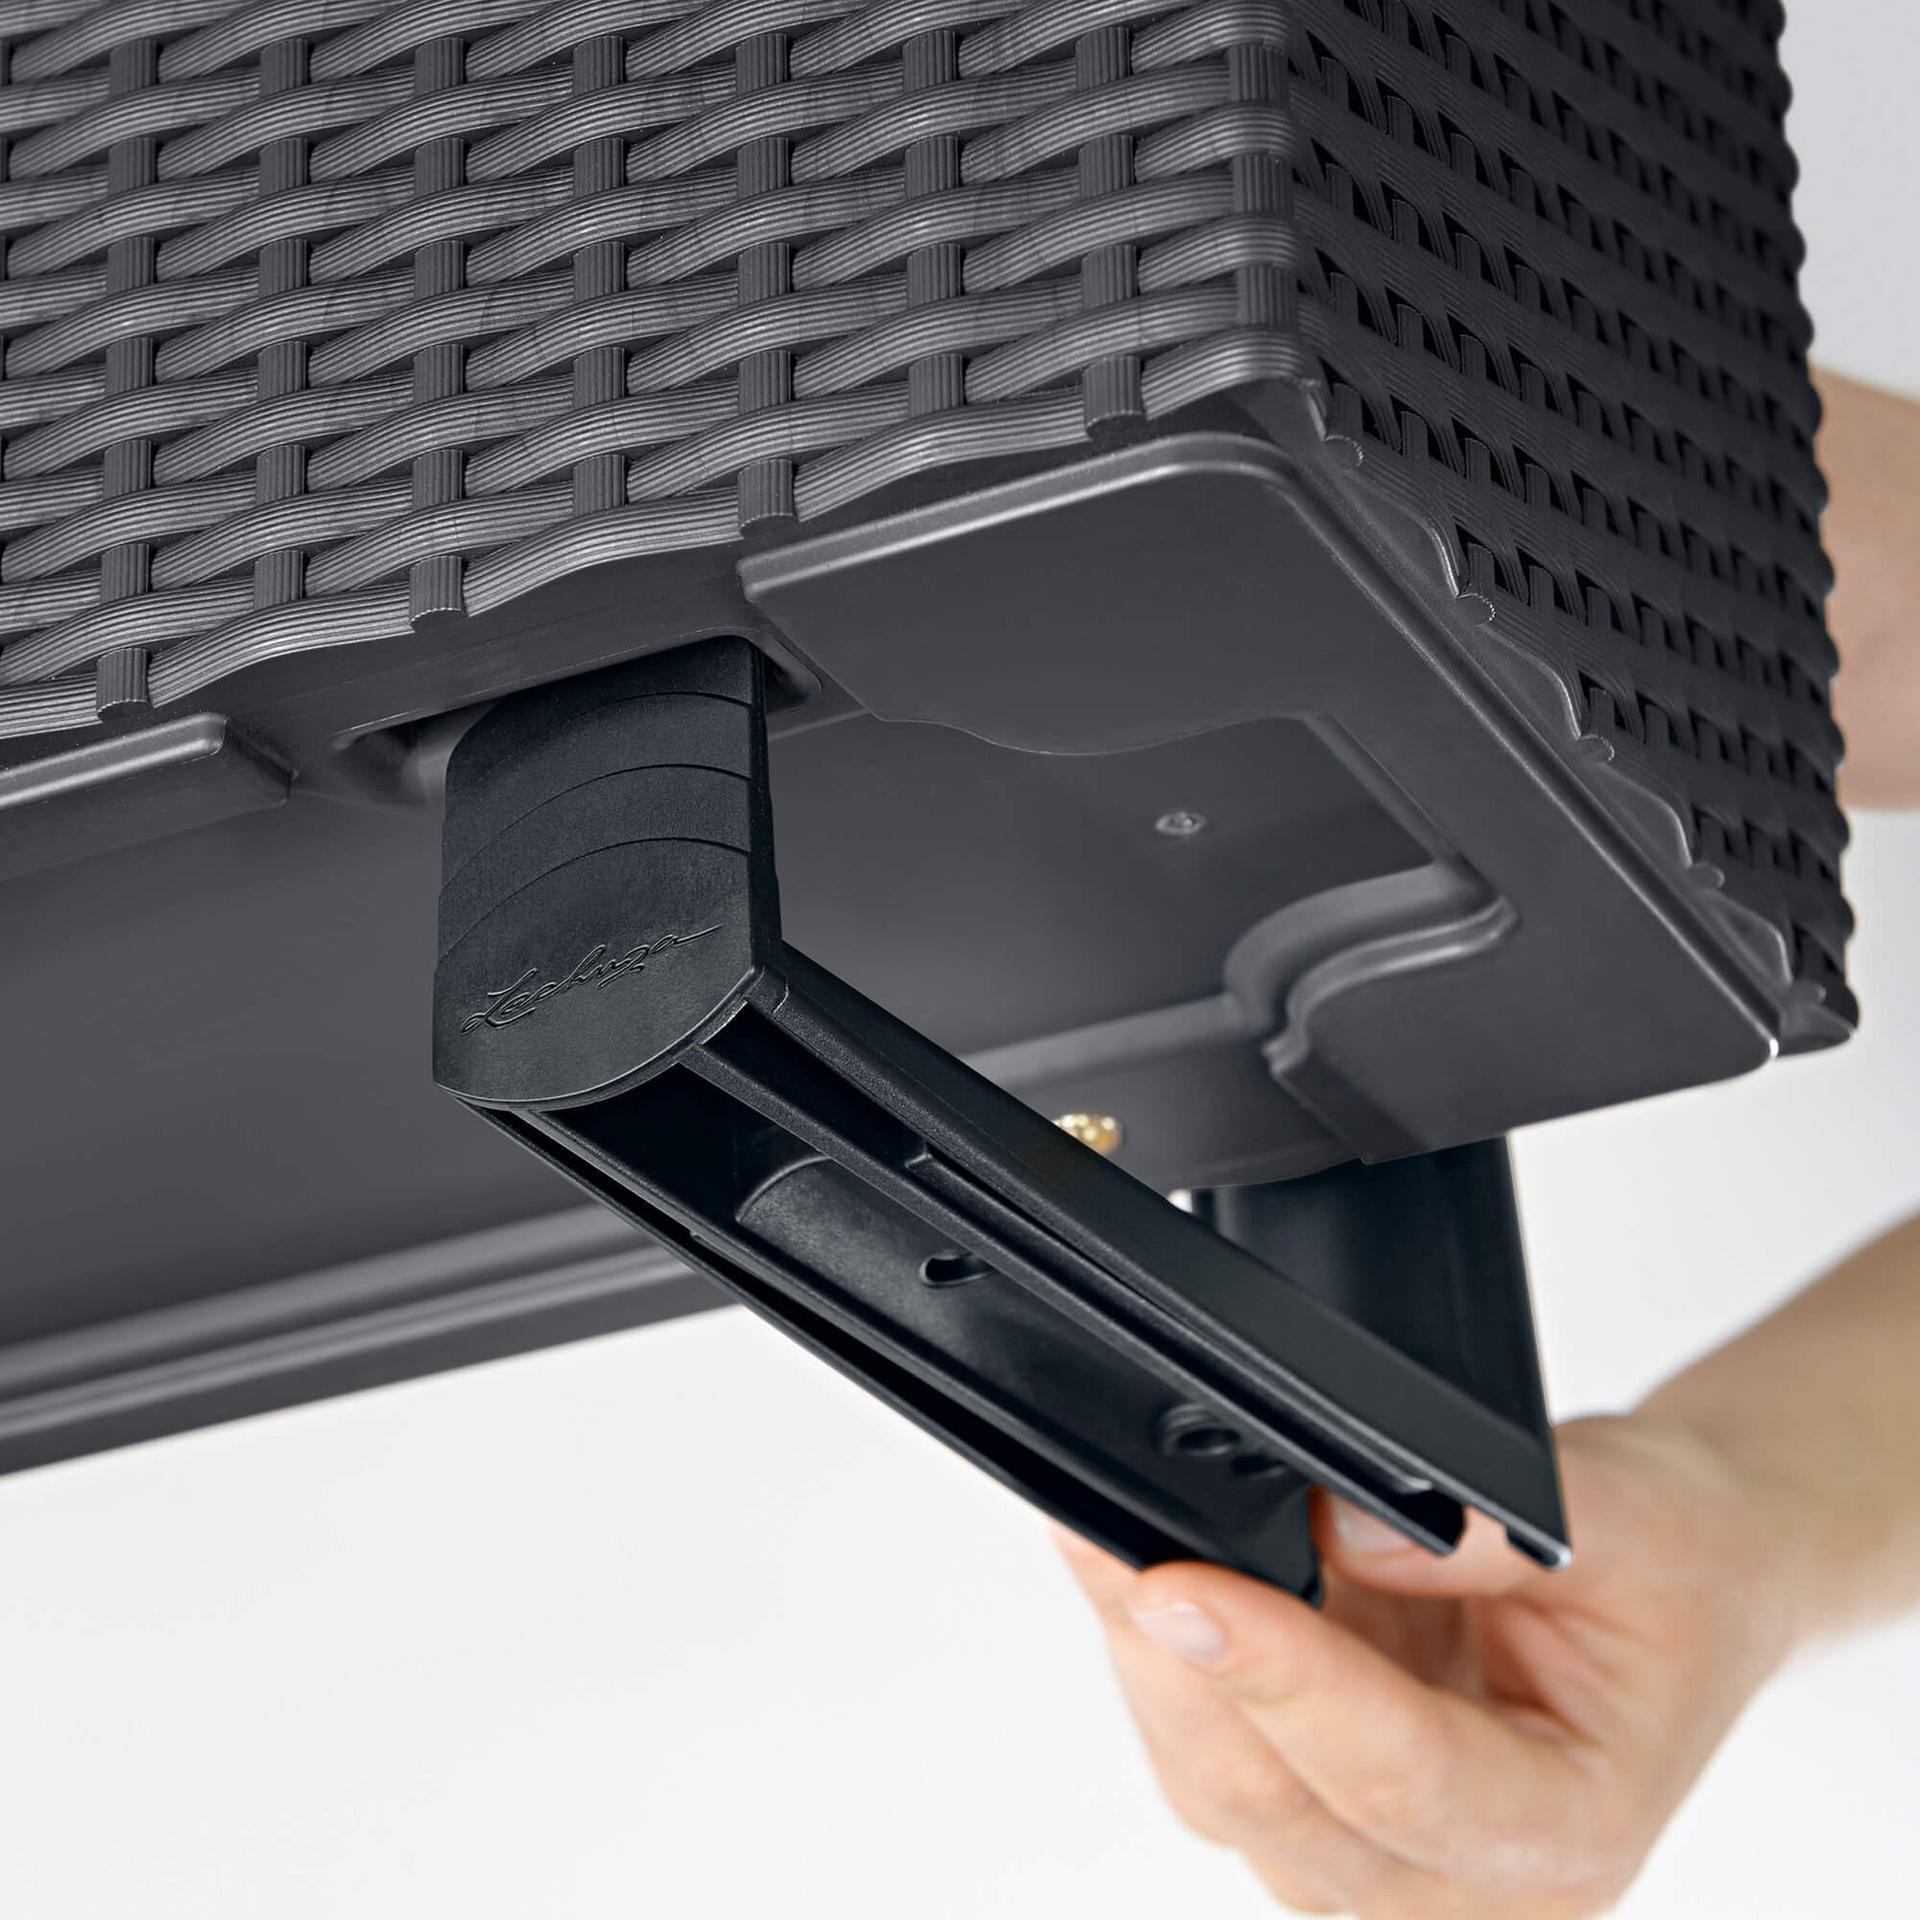 le_balkonkastenhalter-balconera_product_addi_02